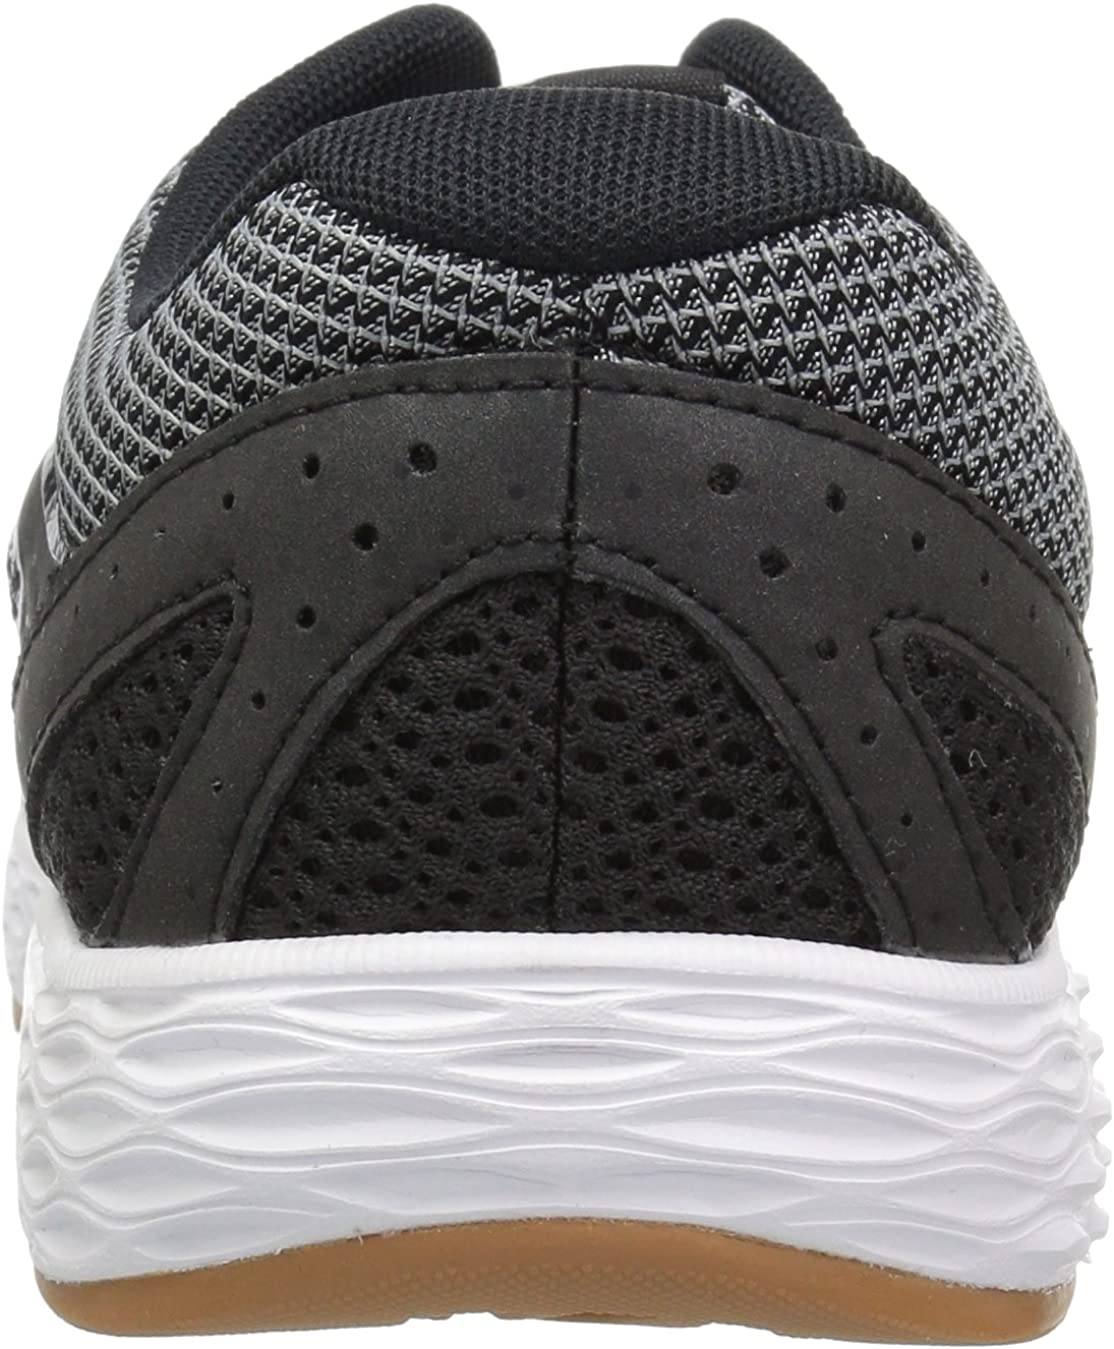 New Balance Women's 520v3 Running Shoe